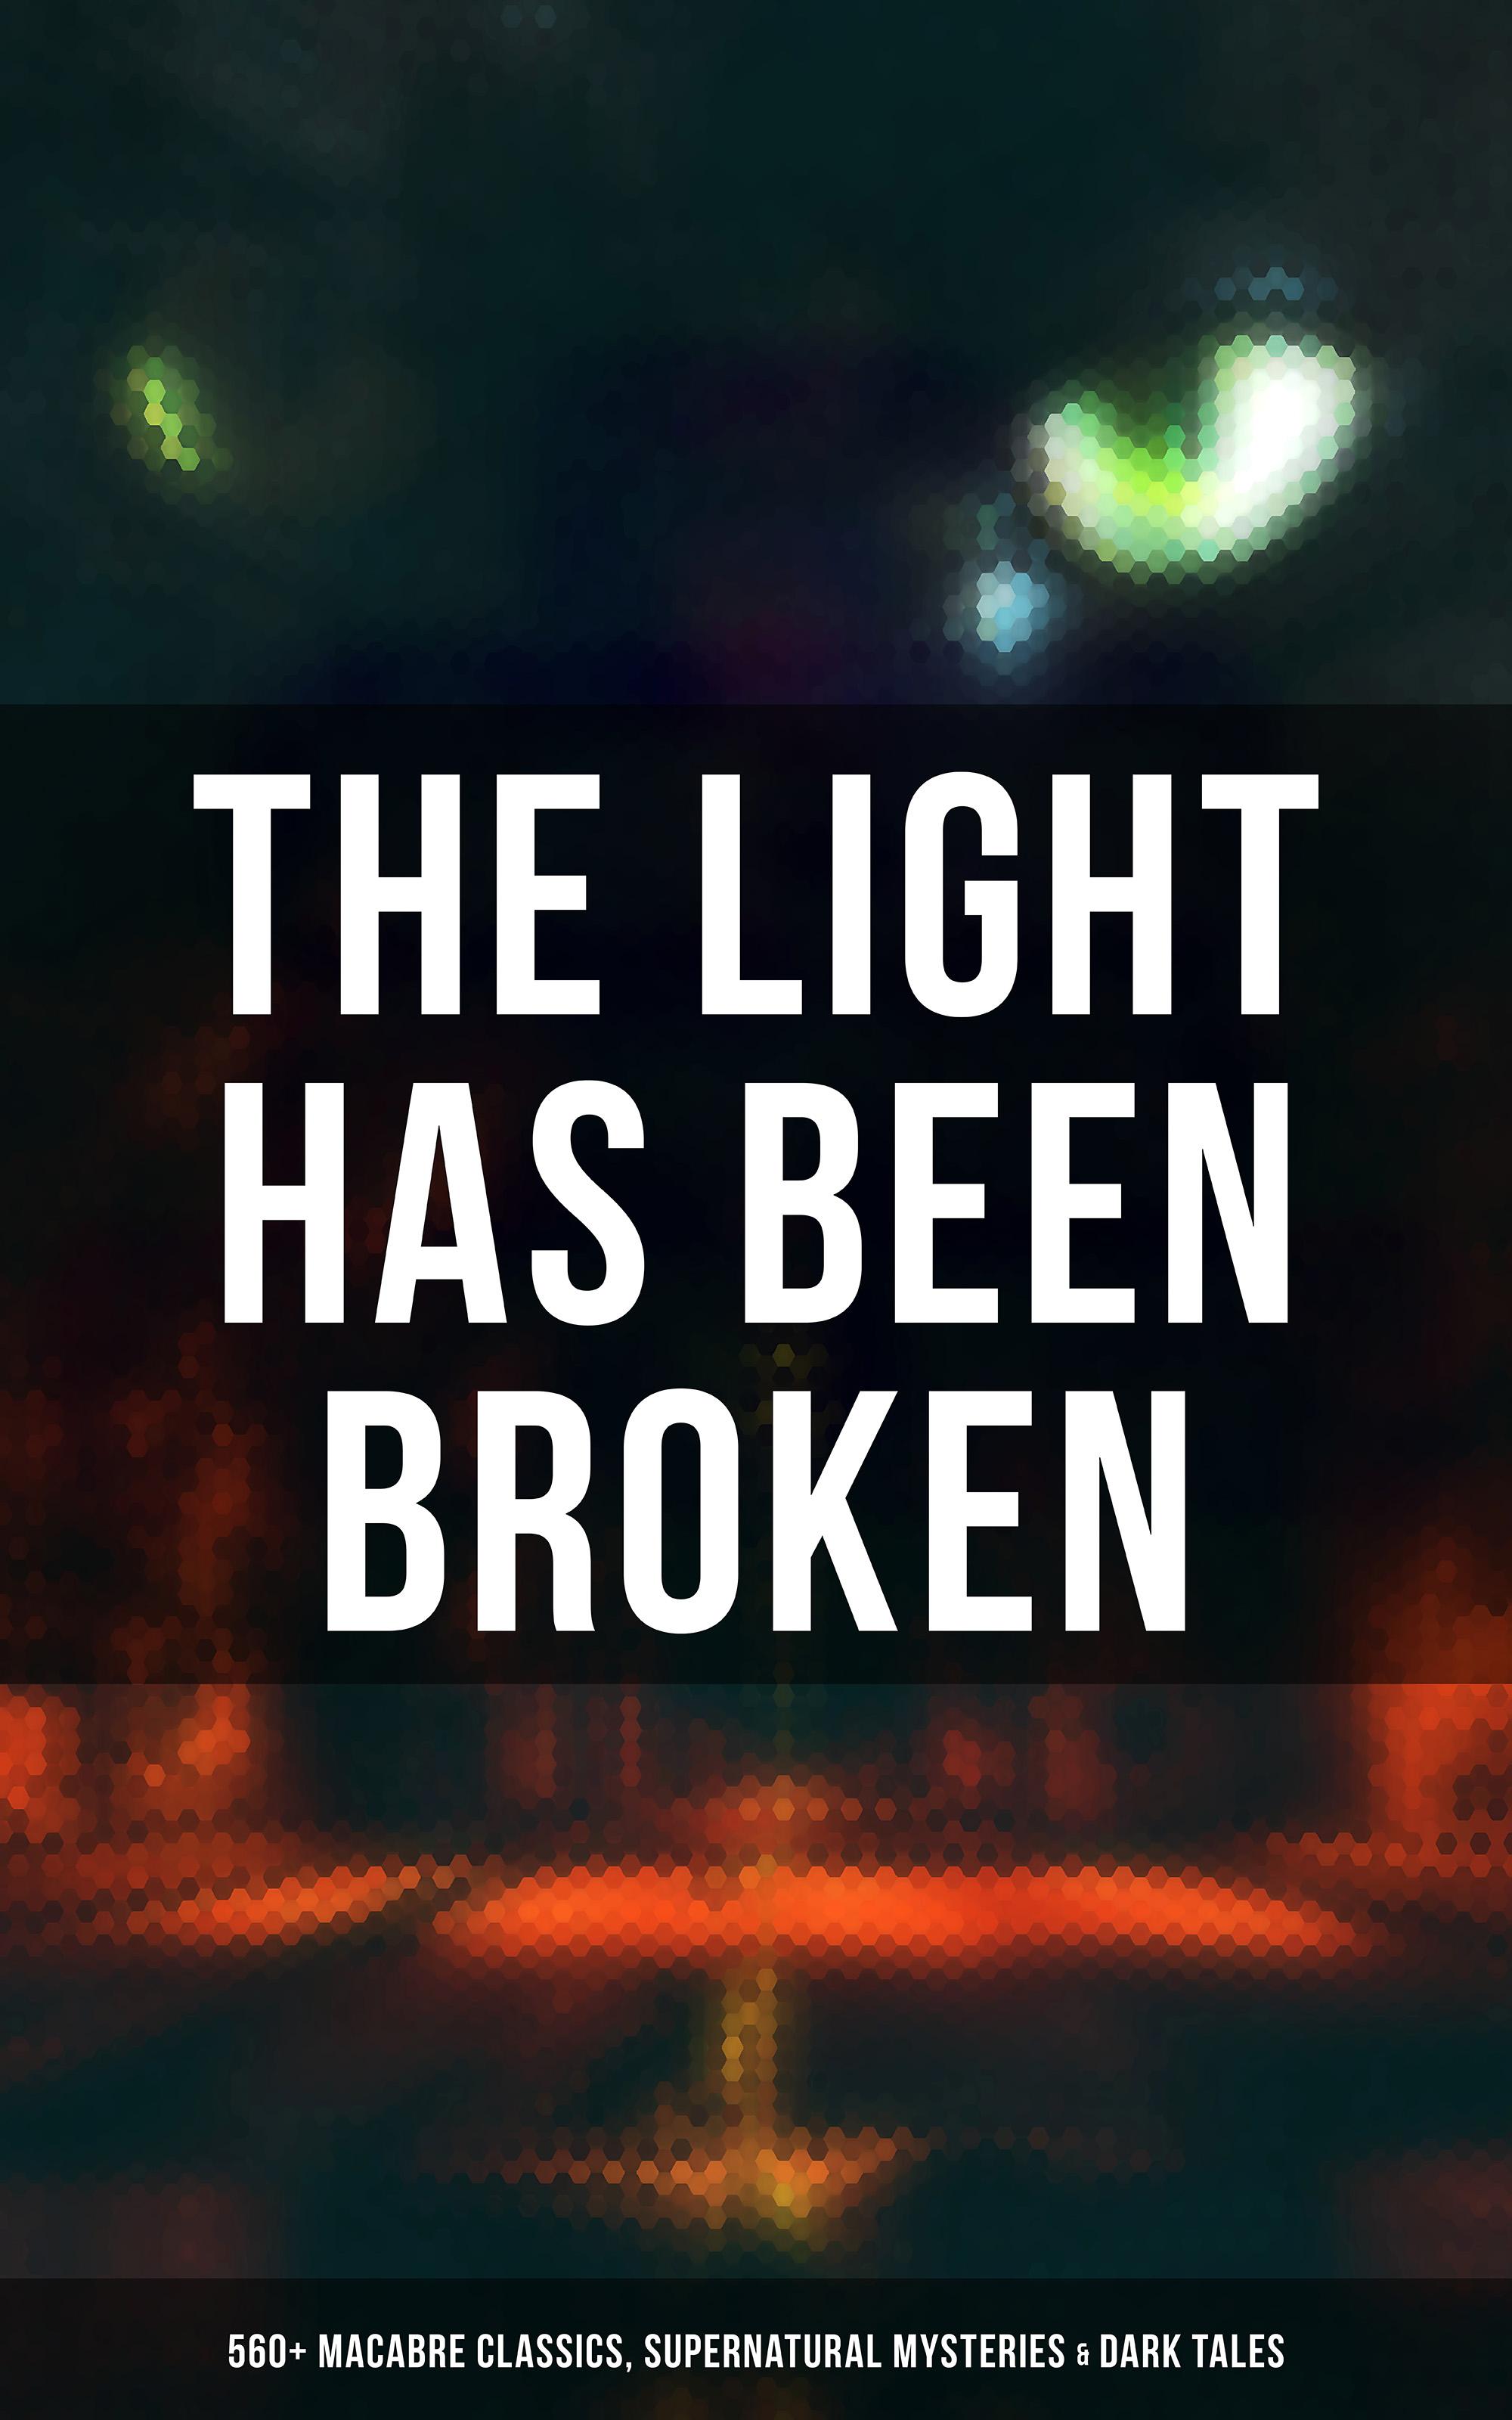 The Light Has Been Broken: 560+ Macabre Classics, Supernatural Mysteries & Dark Tales